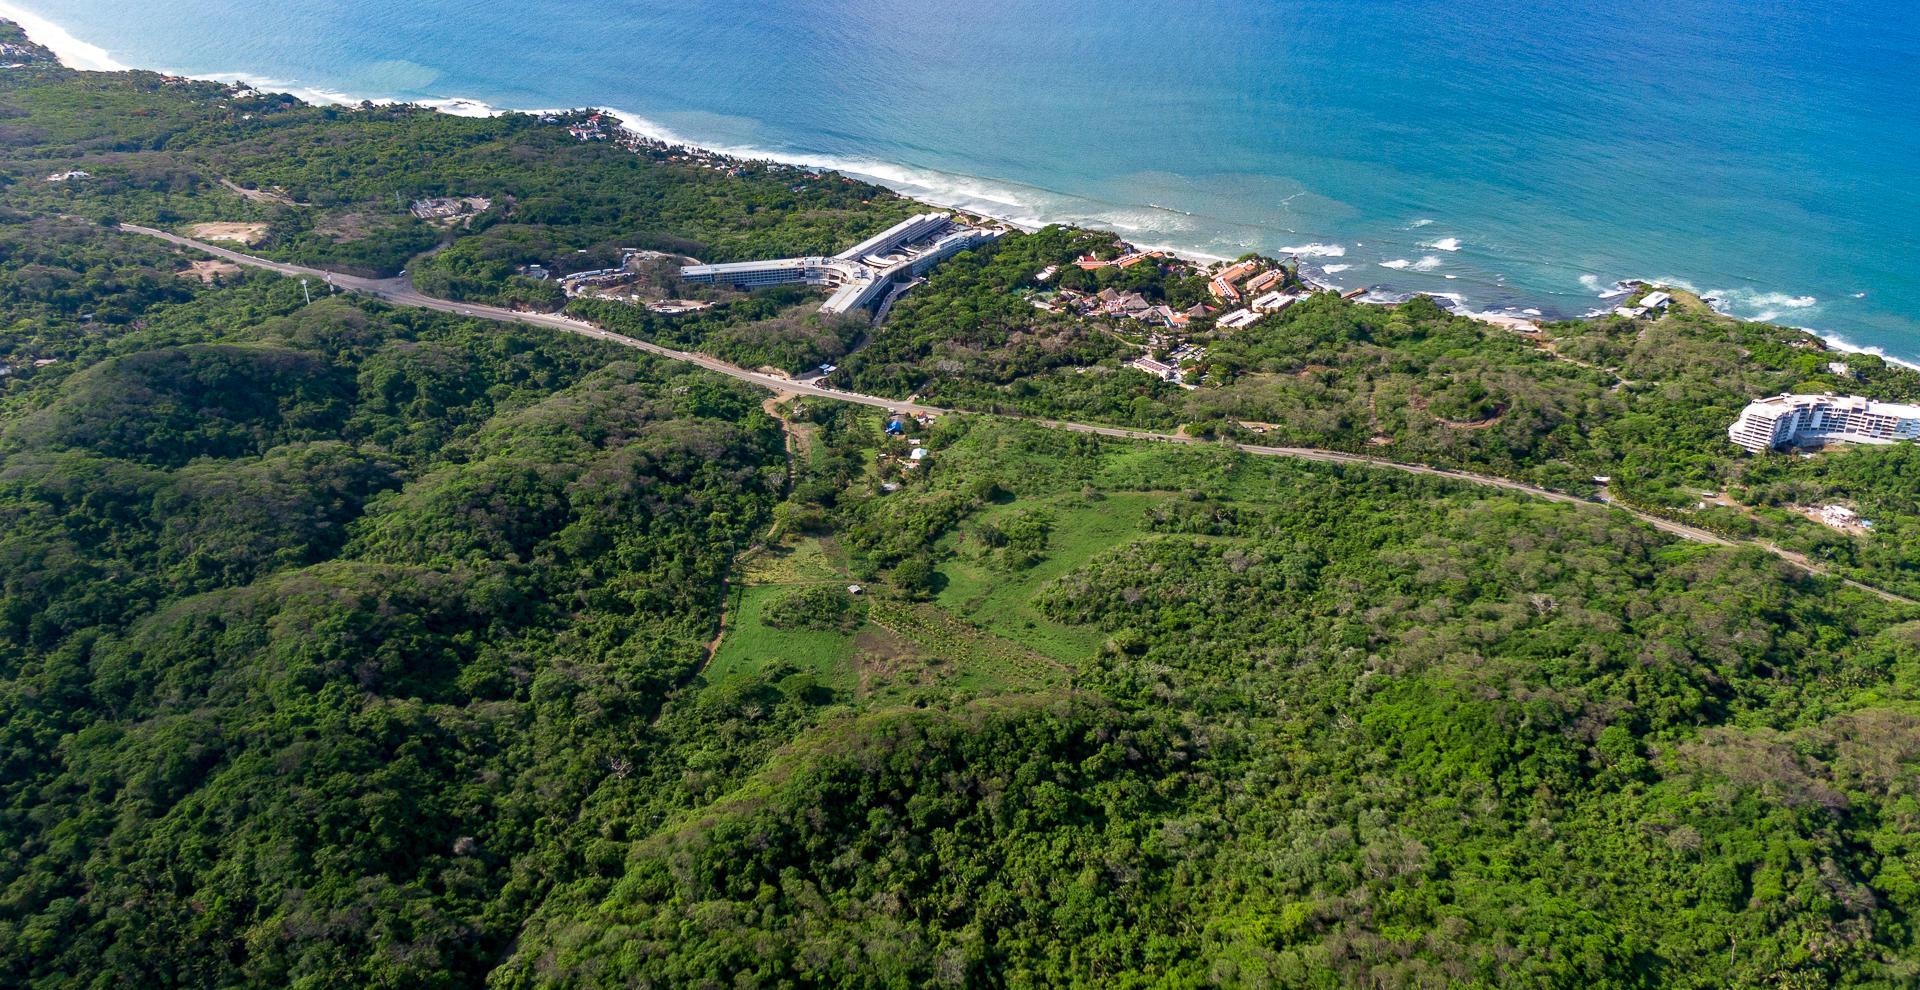 Punta de Mita, ,Land,For Sale,hwy 200,21157